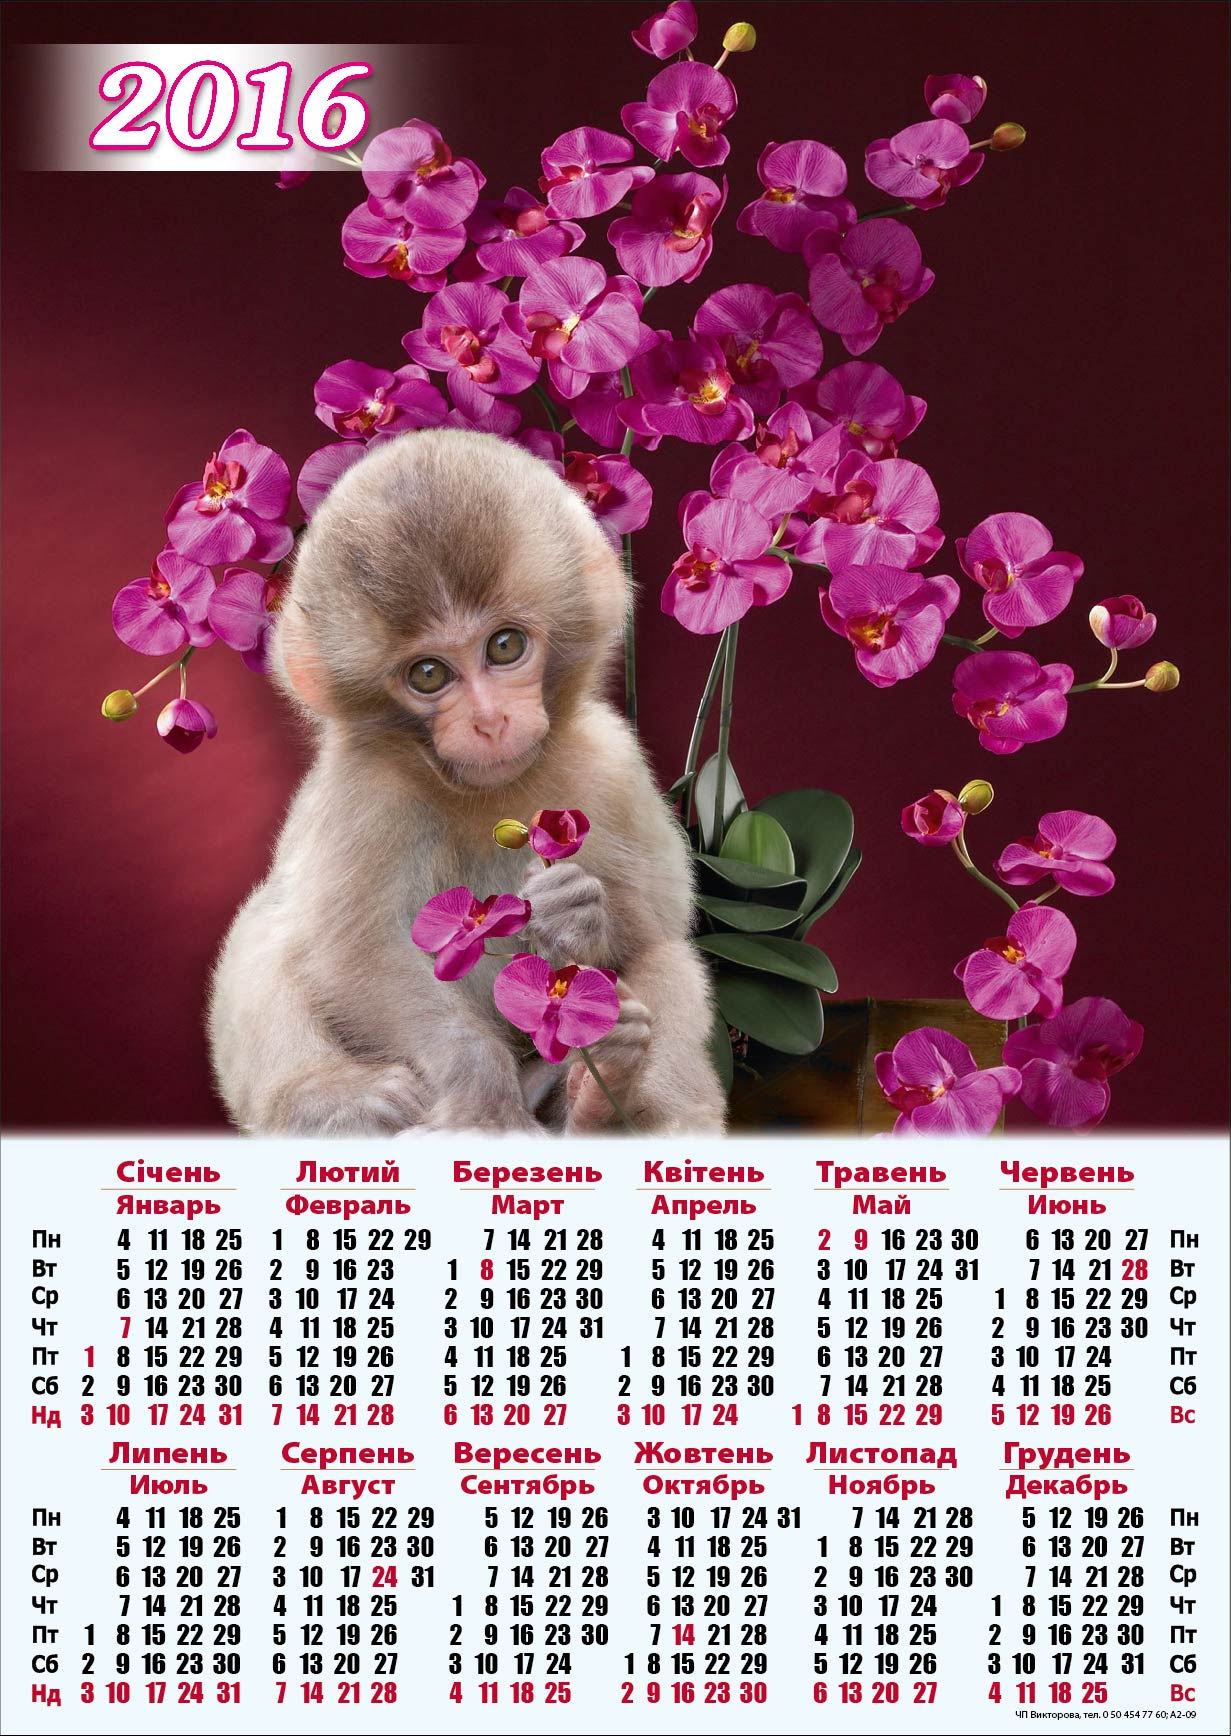 Календарь 2016 год - обои на рабочий стол ...: www.mobilmusic.ru/wallpaper.php?id=1362170